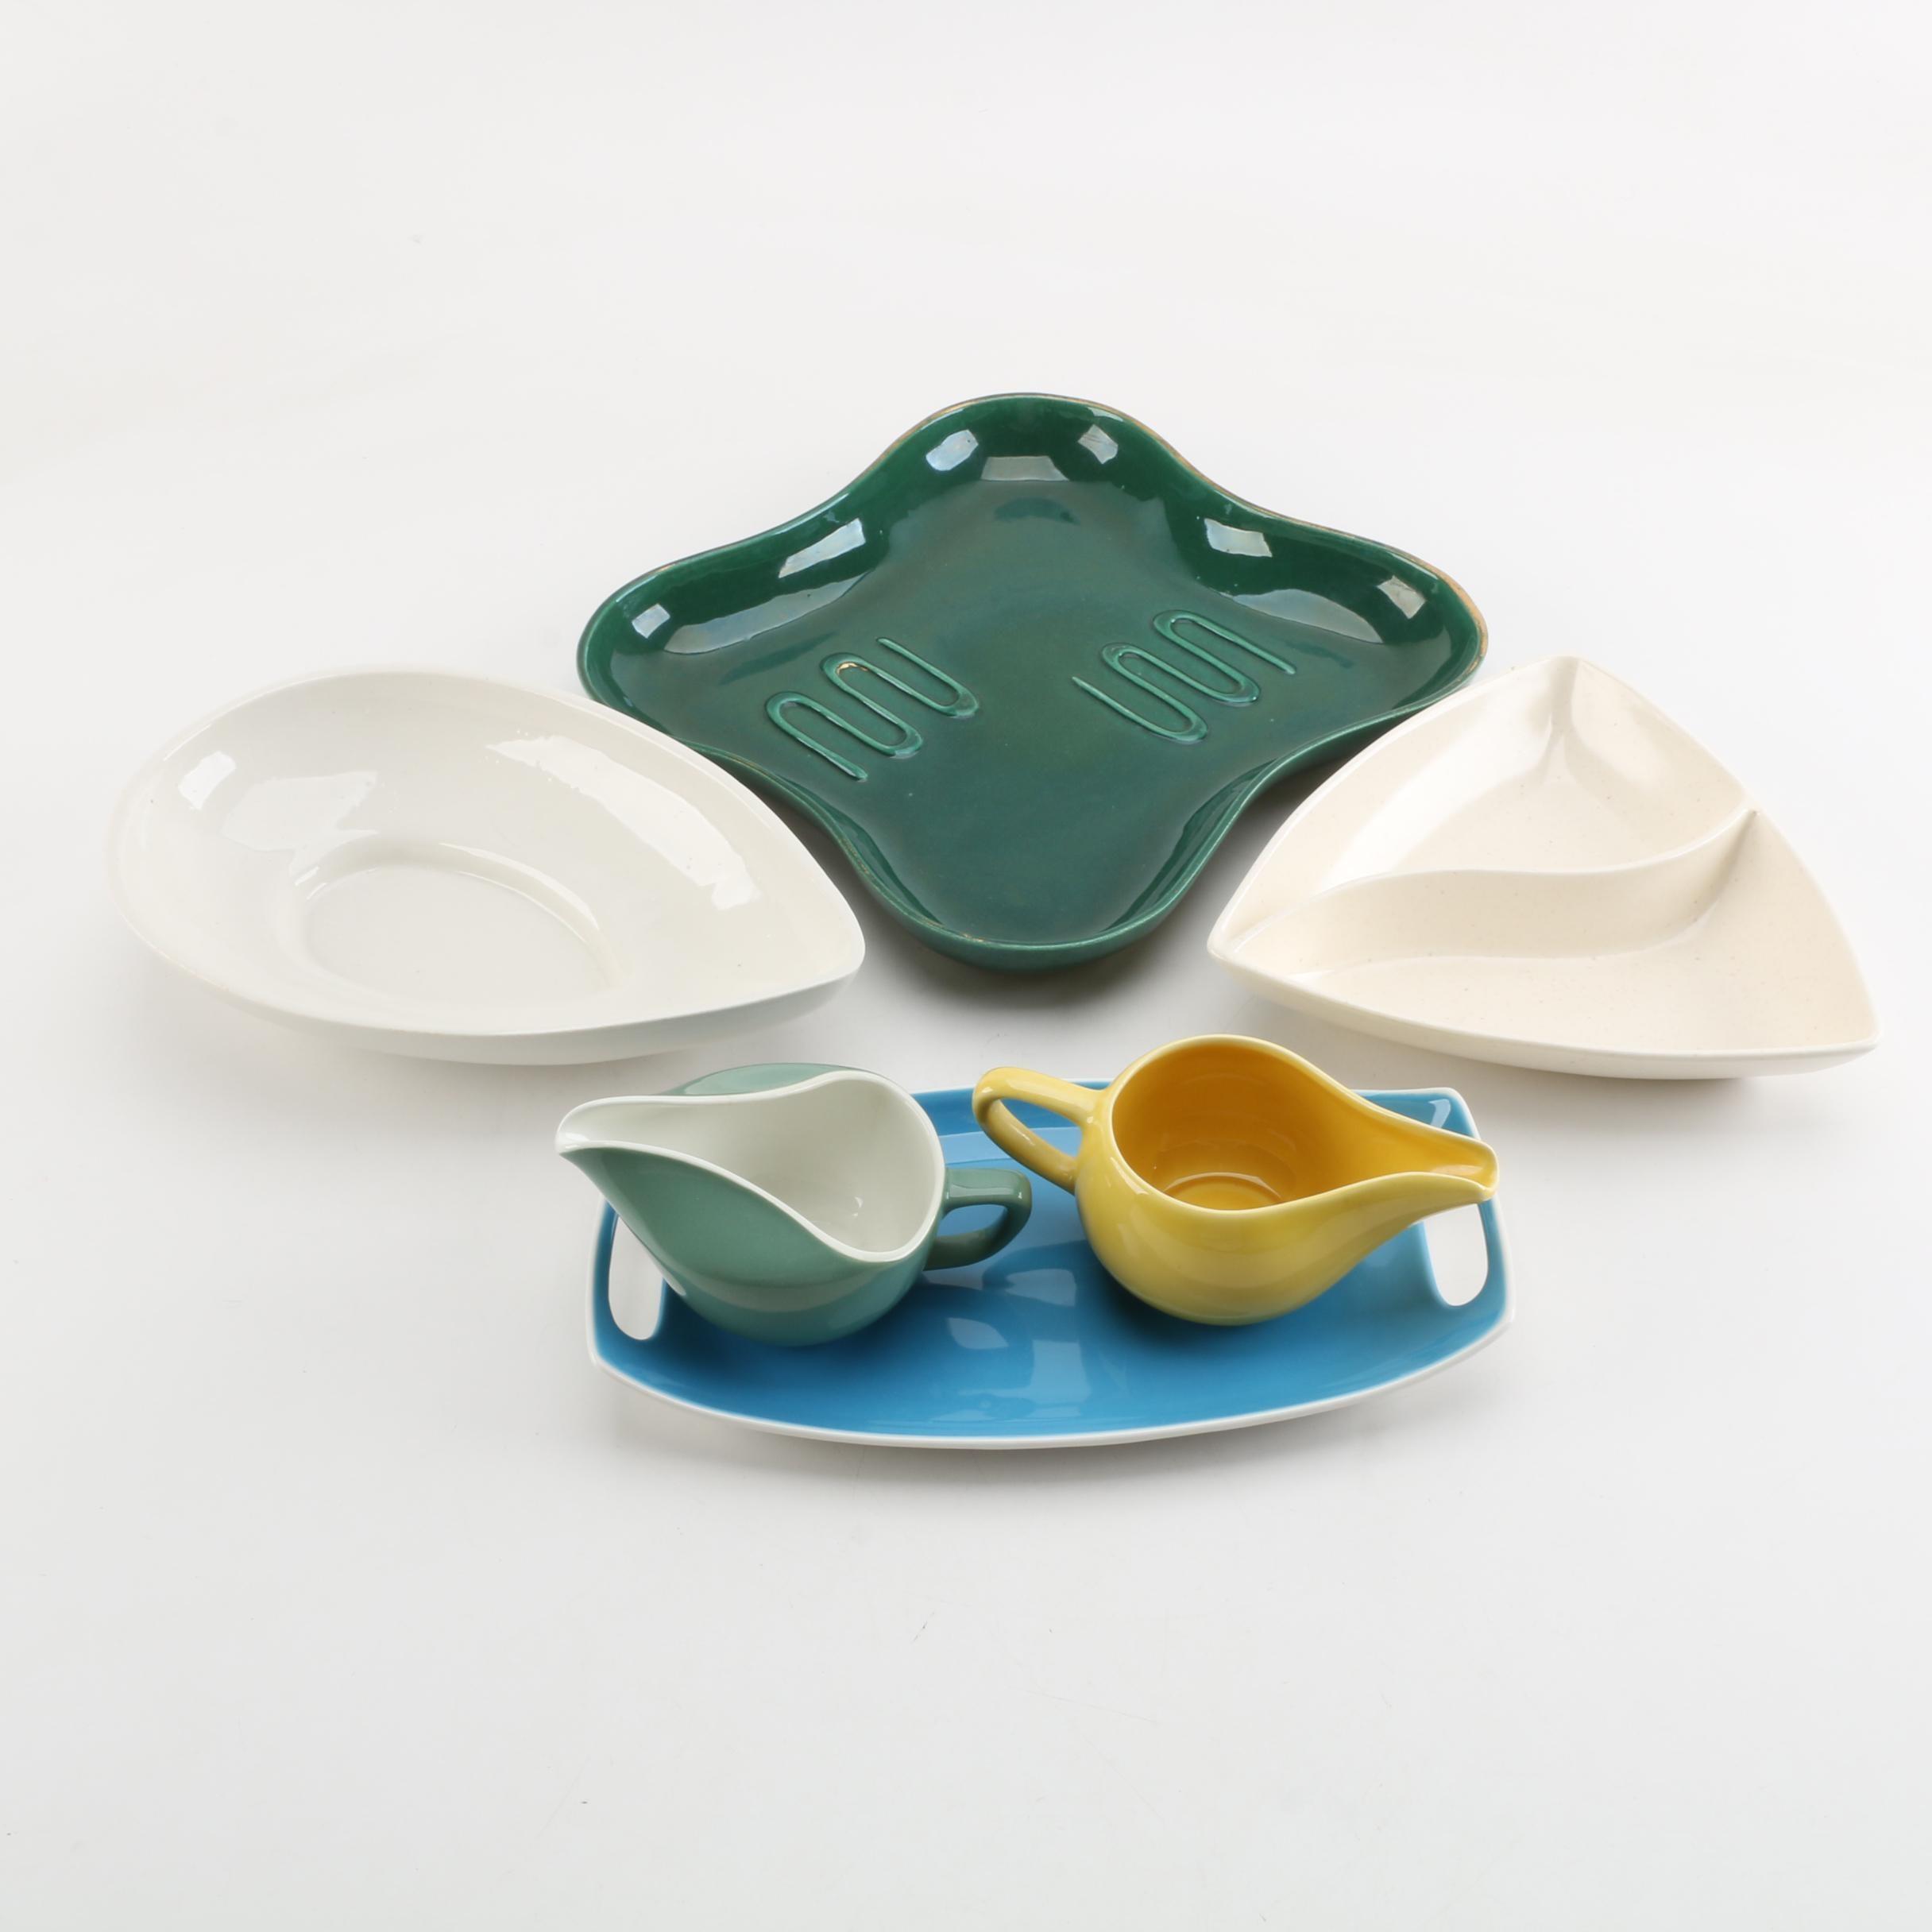 Vintage Ceramic Serveware Including Santa Anita Ware